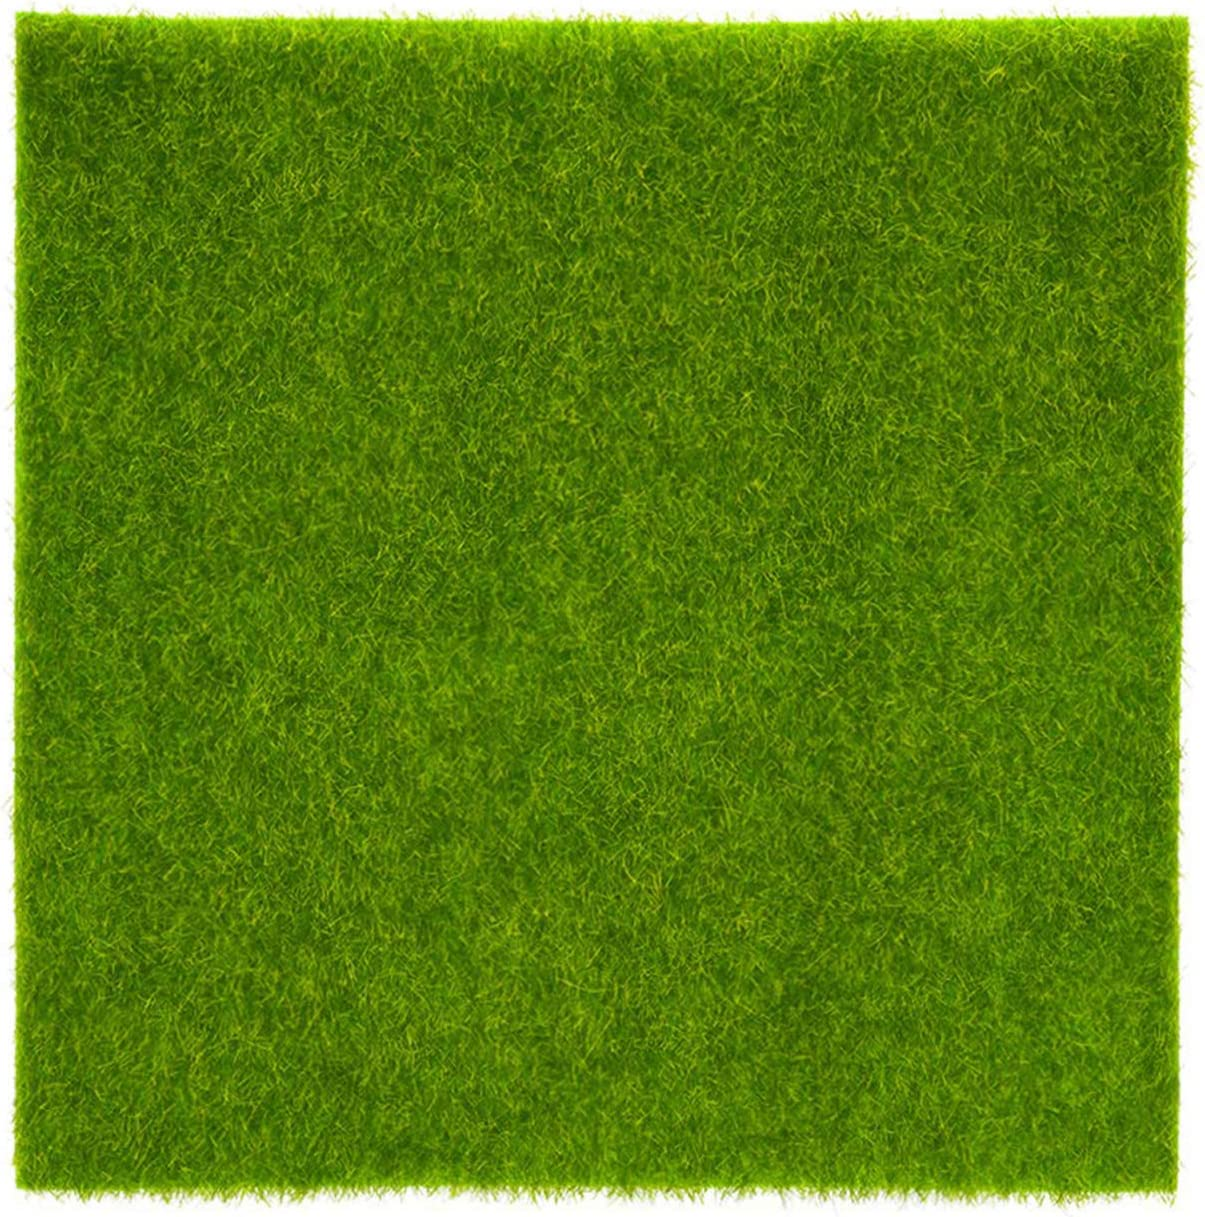 Max 63% OFF Zerodis Synthetic Lawn Artificial Grass Gazon De 2021 autumn and winter new Outdoor Tapis